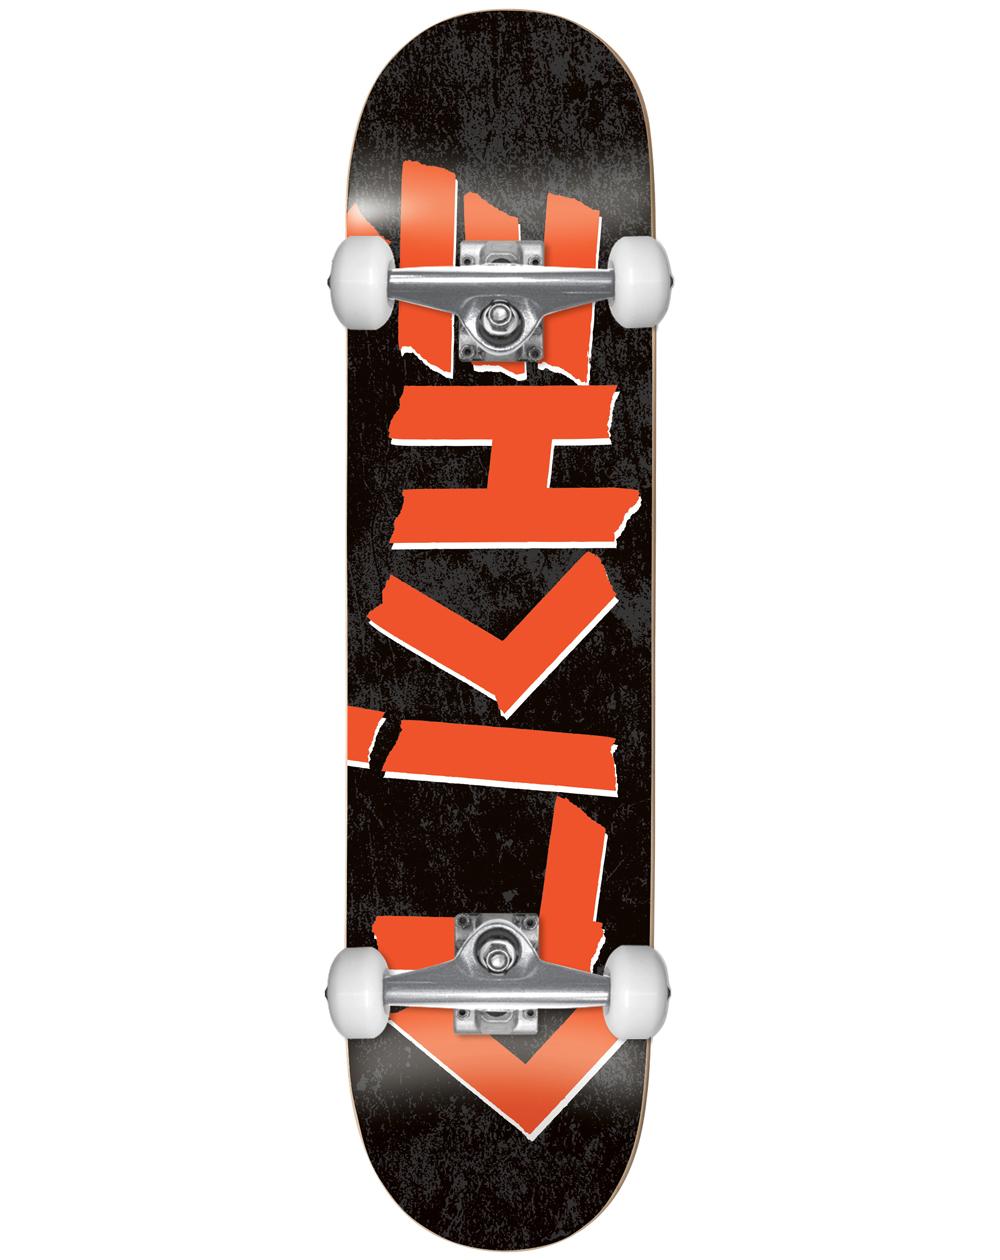 "Cliché Scotch 7.75"" Complete Skateboard Black/Red"